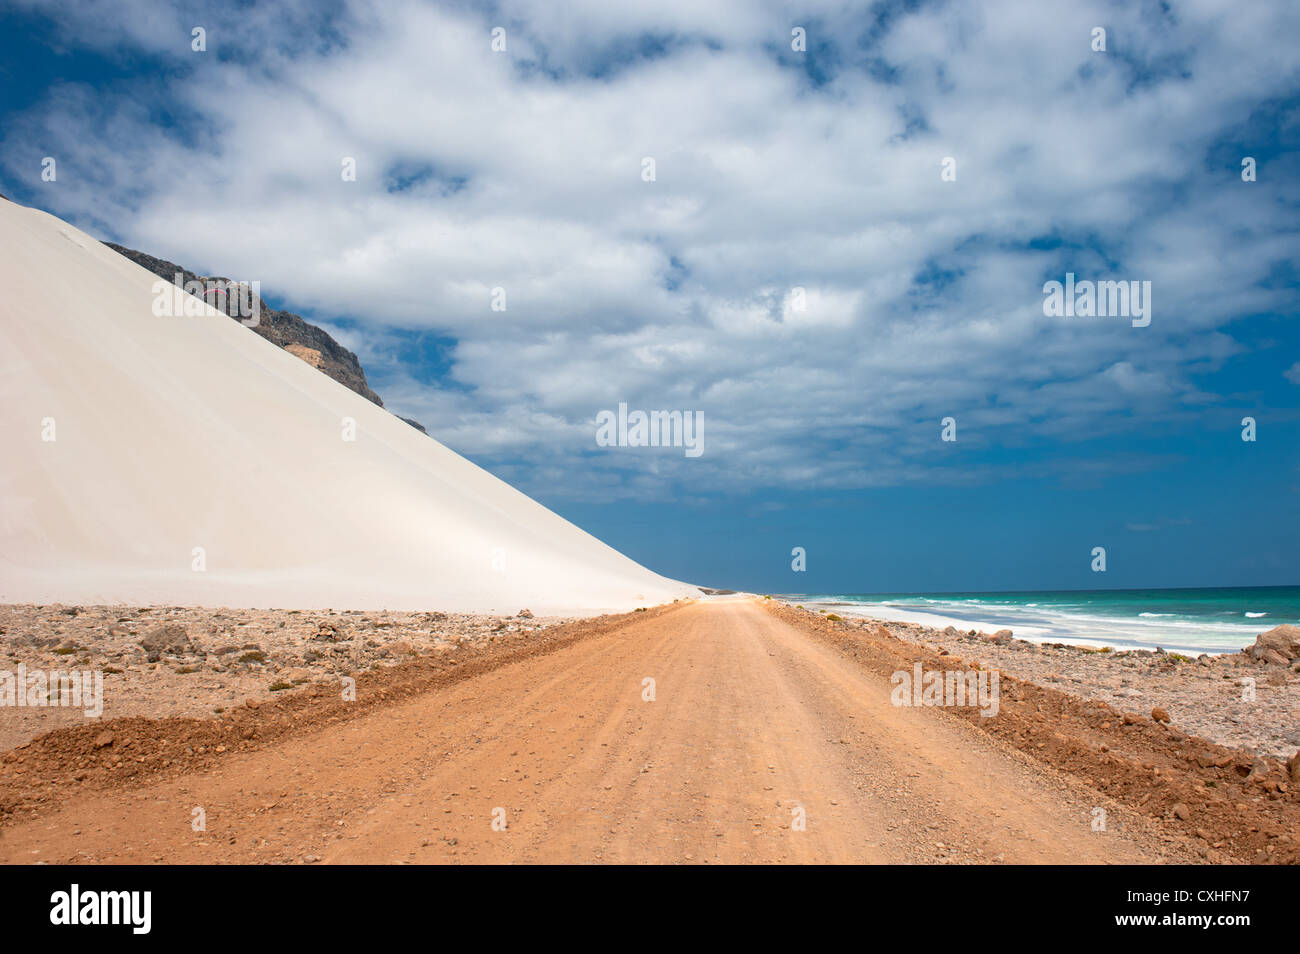 Sand dunes of Archer, Socotra island, Yemen - Stock Image